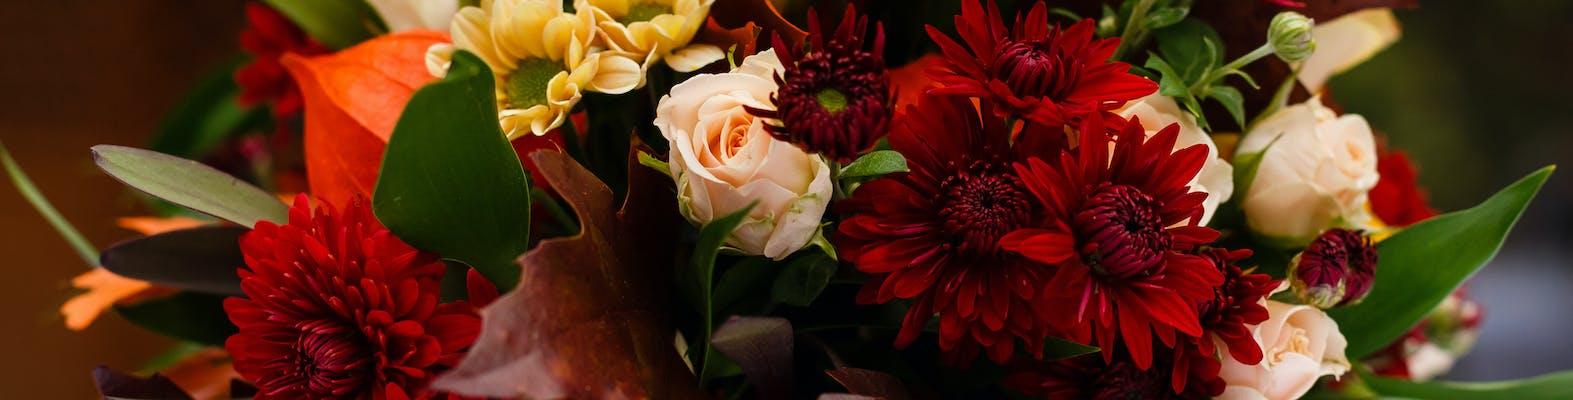 Boston Florist & Massachusetts Flower Shop - Central Square